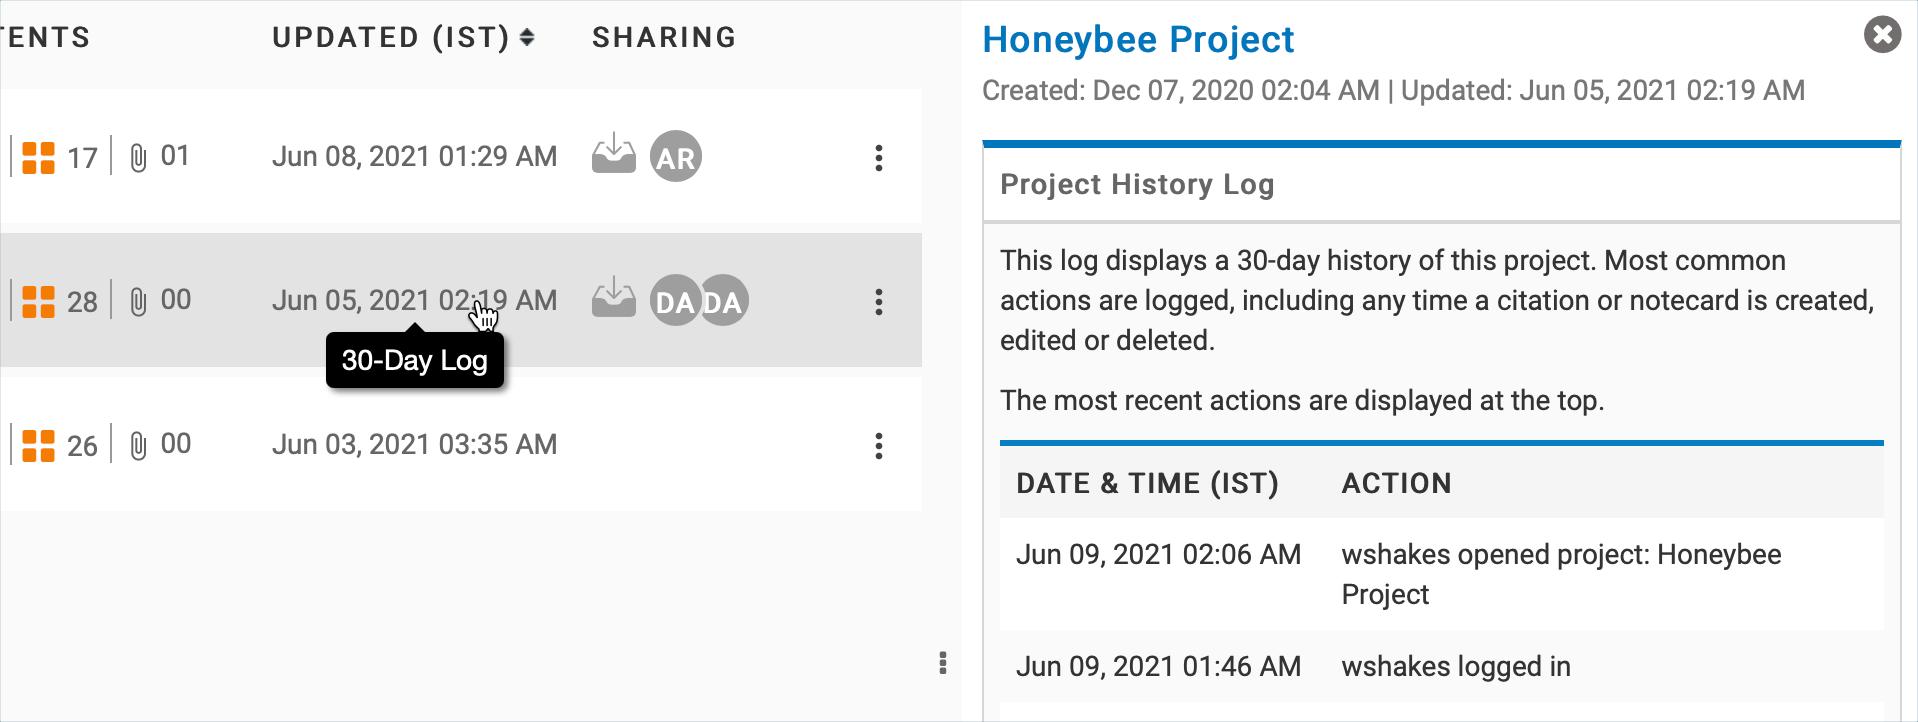 Project History Log